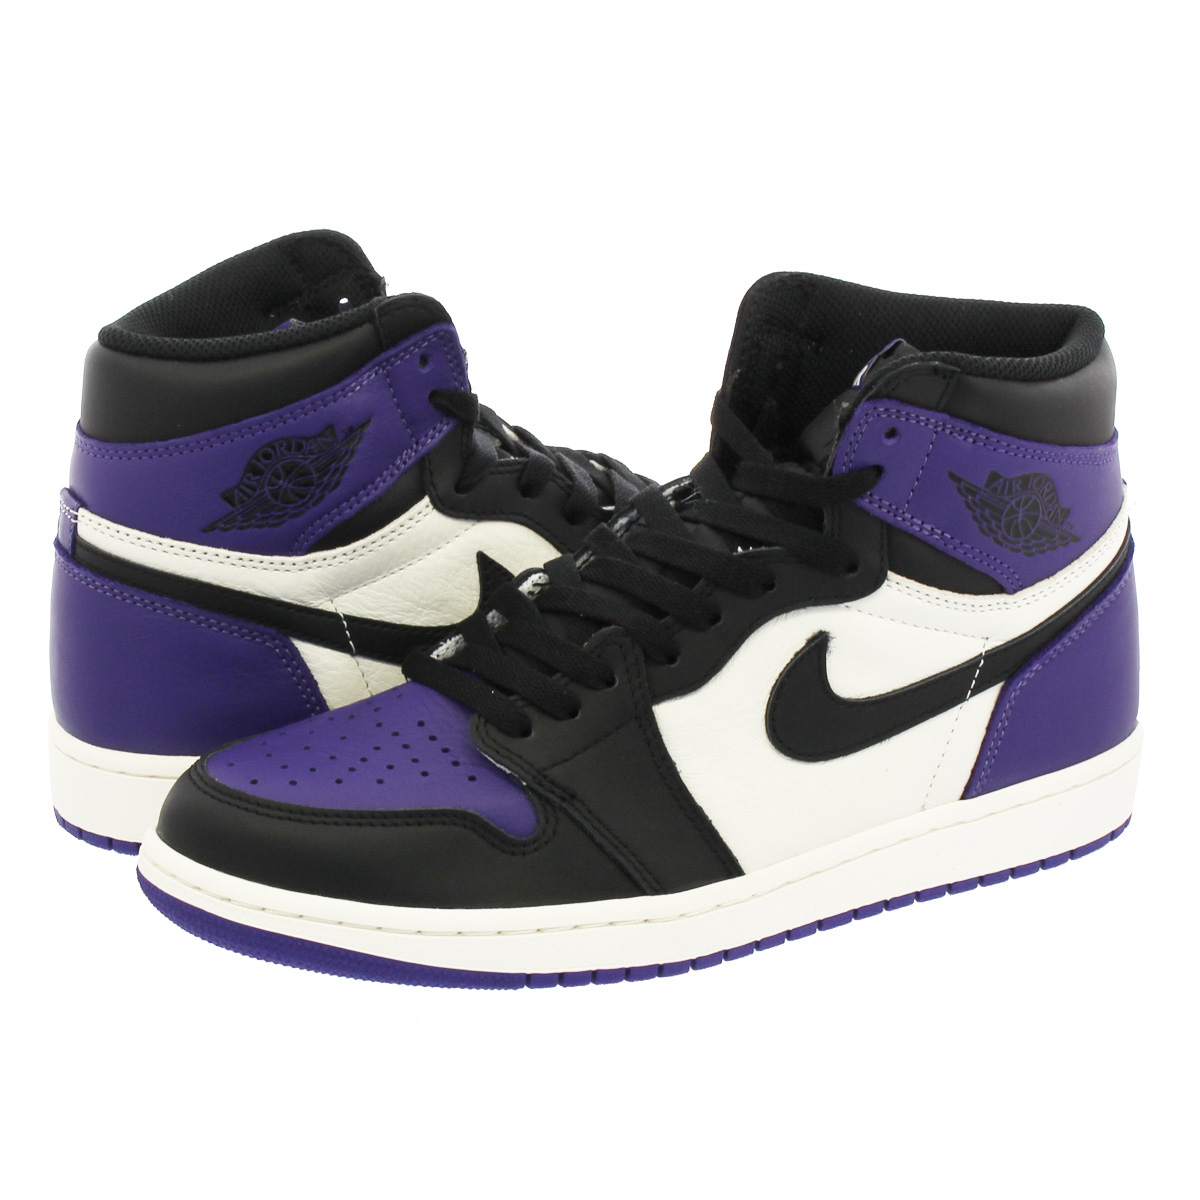 63bf71ad989a NIKE AIR JORDAN 1 RETRO HIGH OG Nike Air Jordan 1 nostalgic high OG COURT  PURPLE BLACK SAIL 555